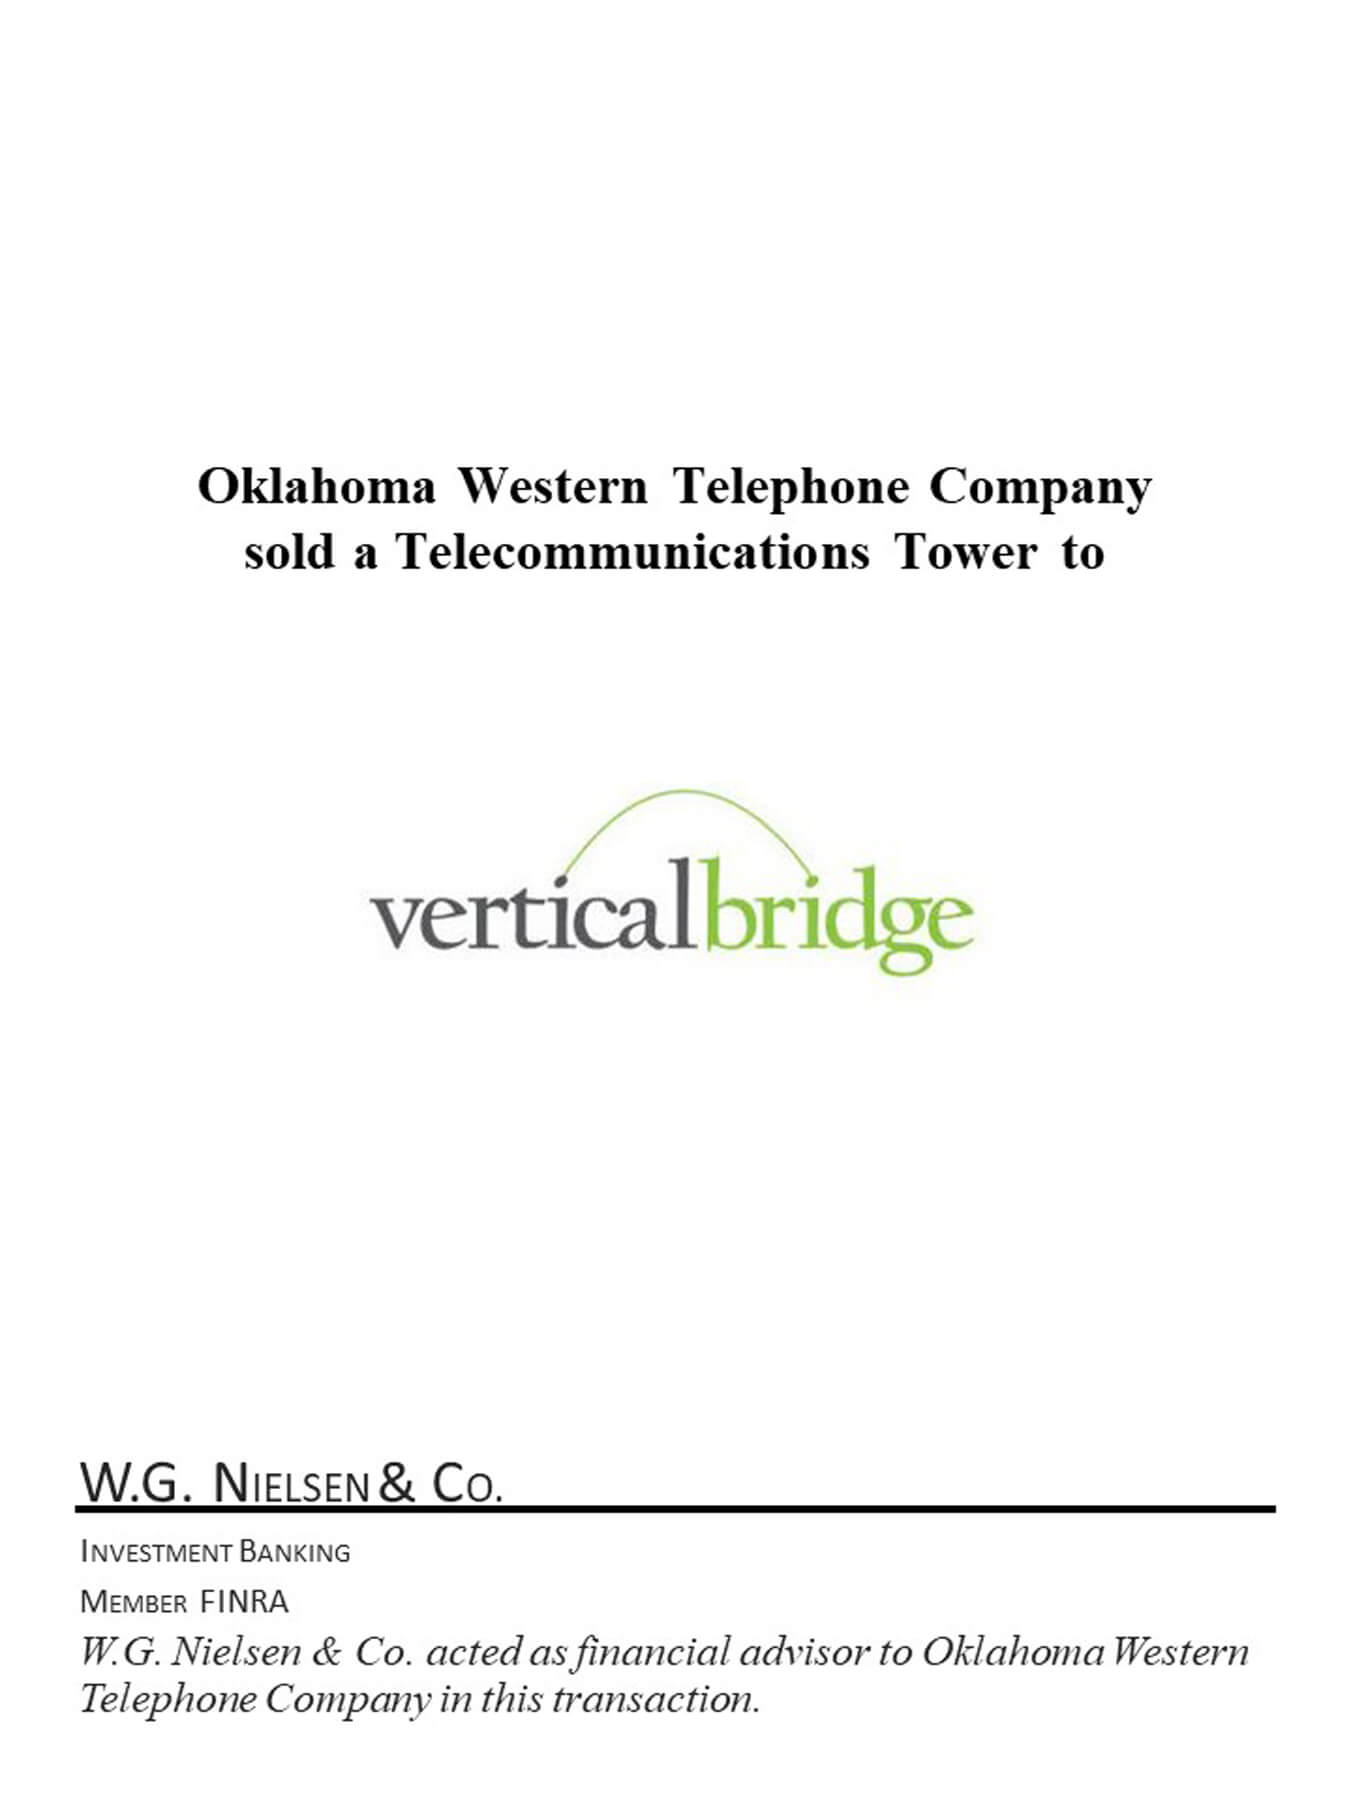 oklahoma western telephone financial transaction